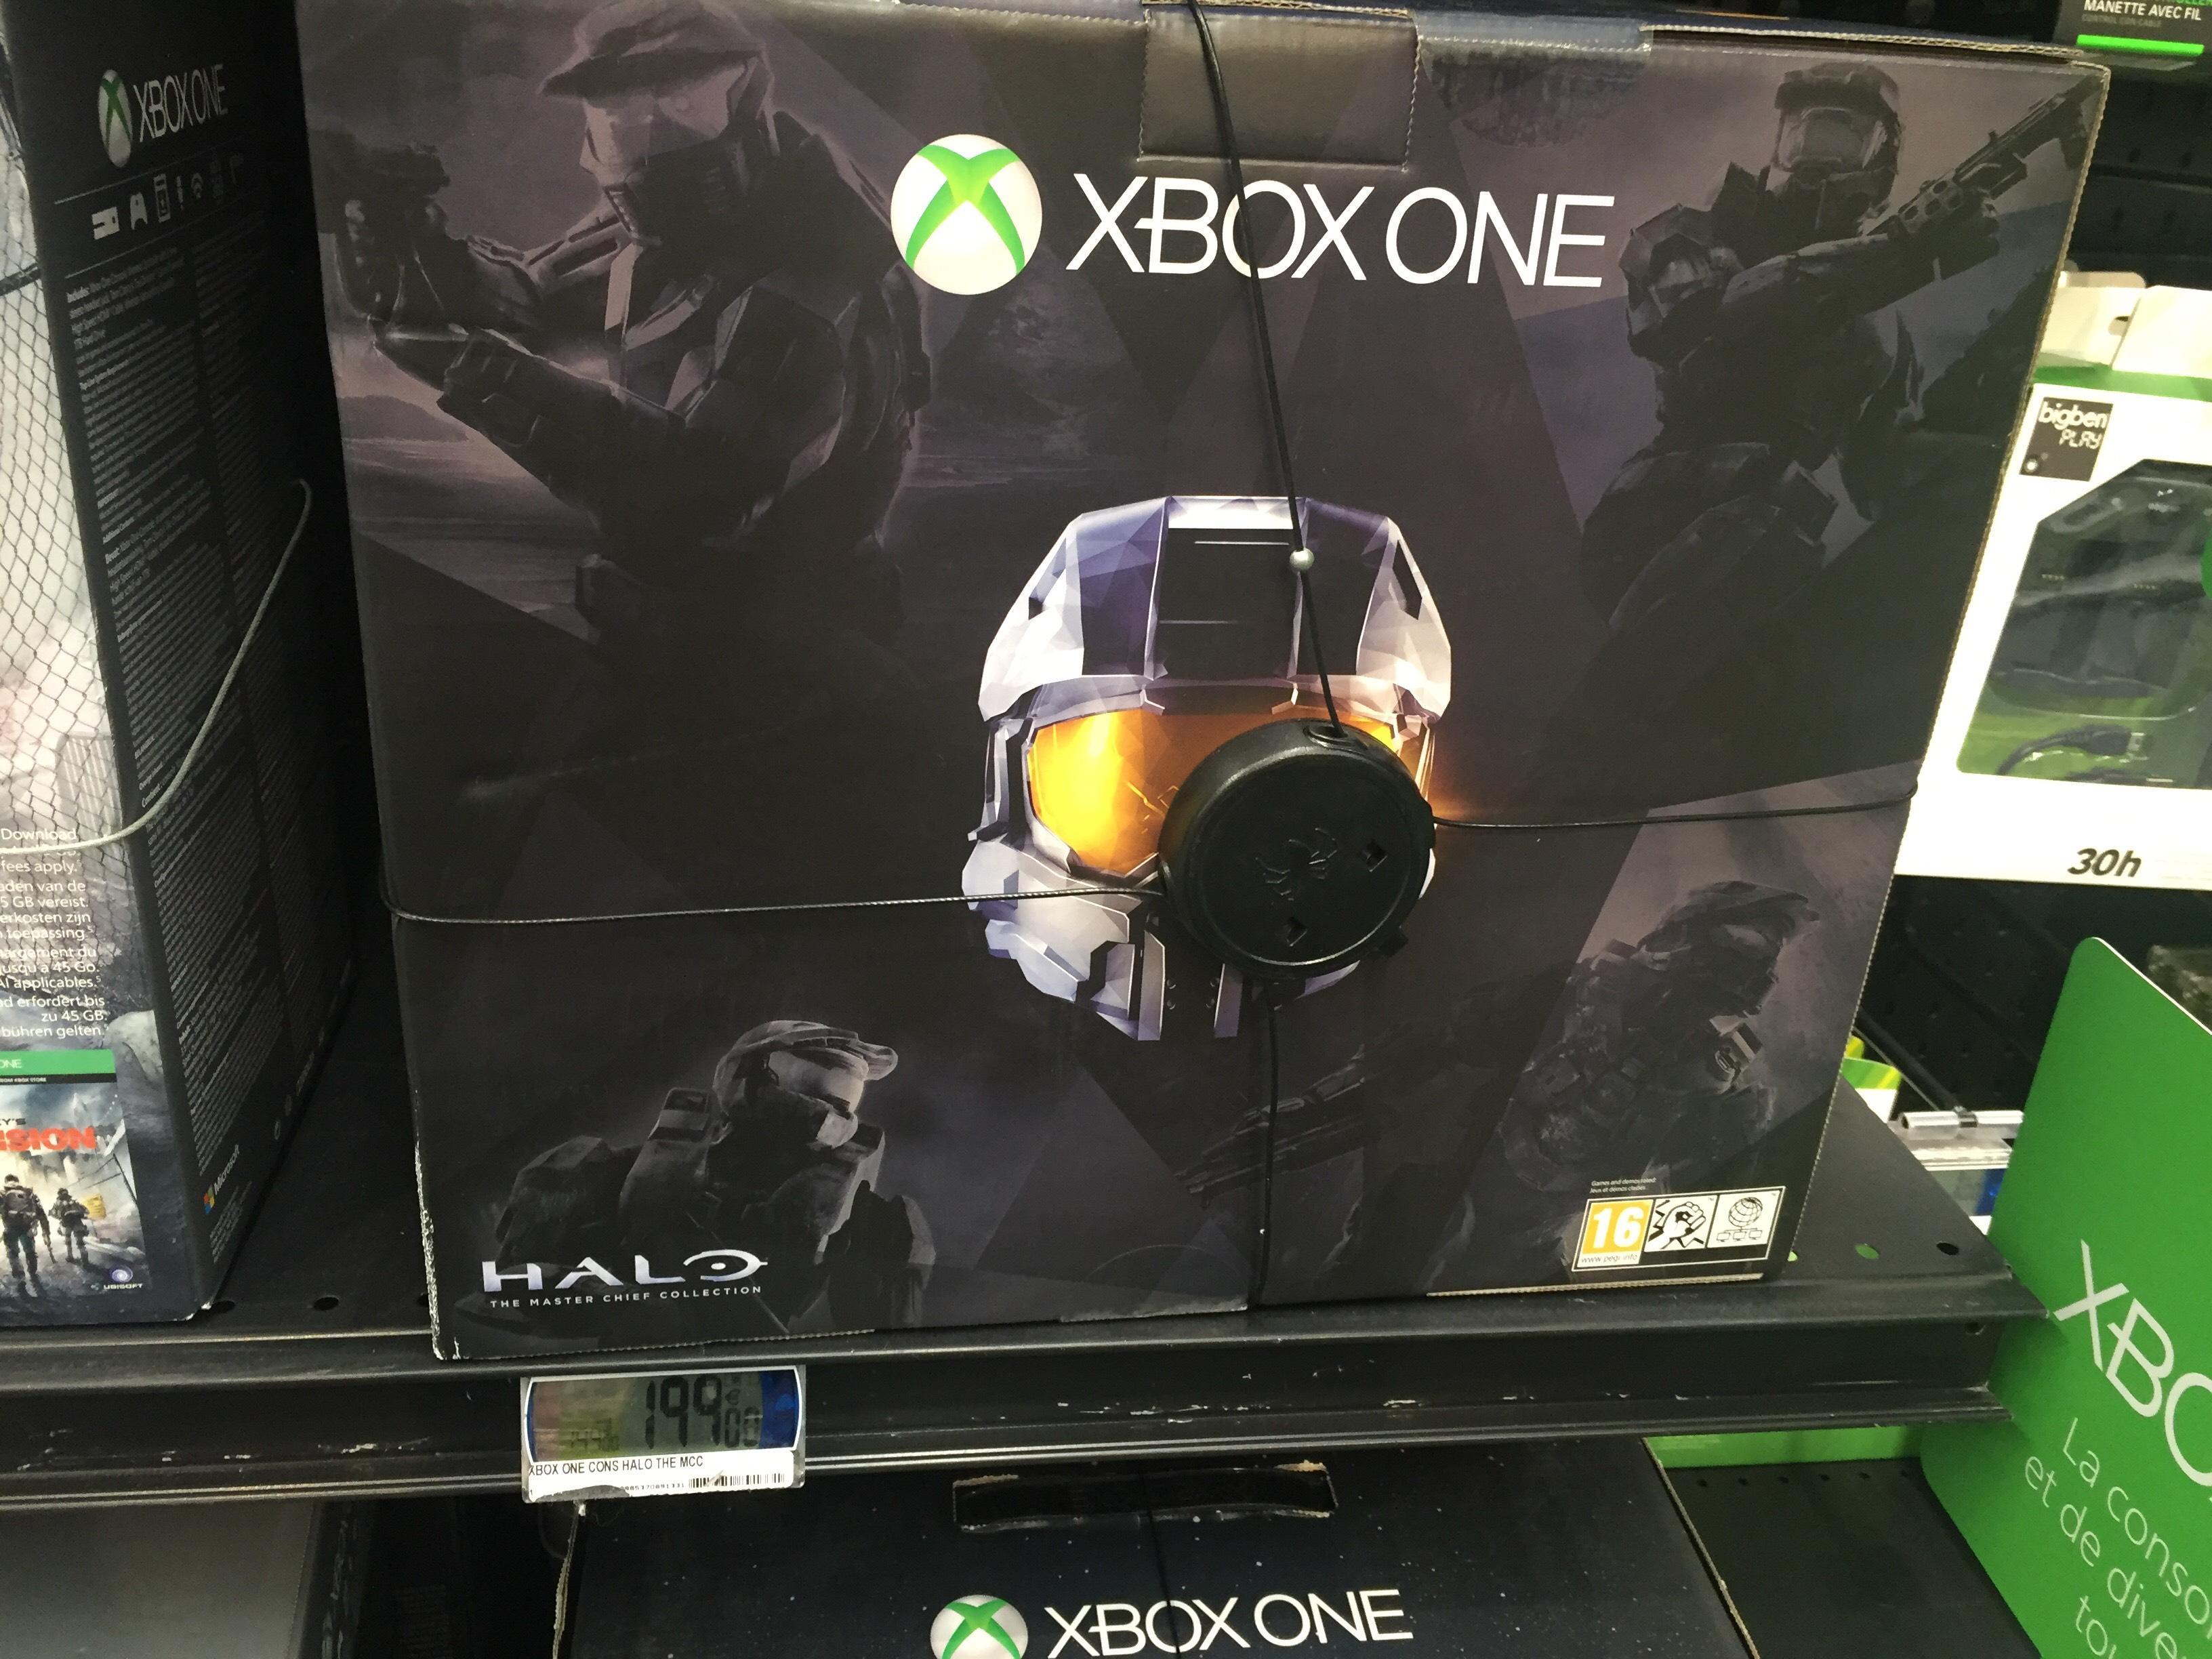 Xbox one 500go edition Halo Materchief